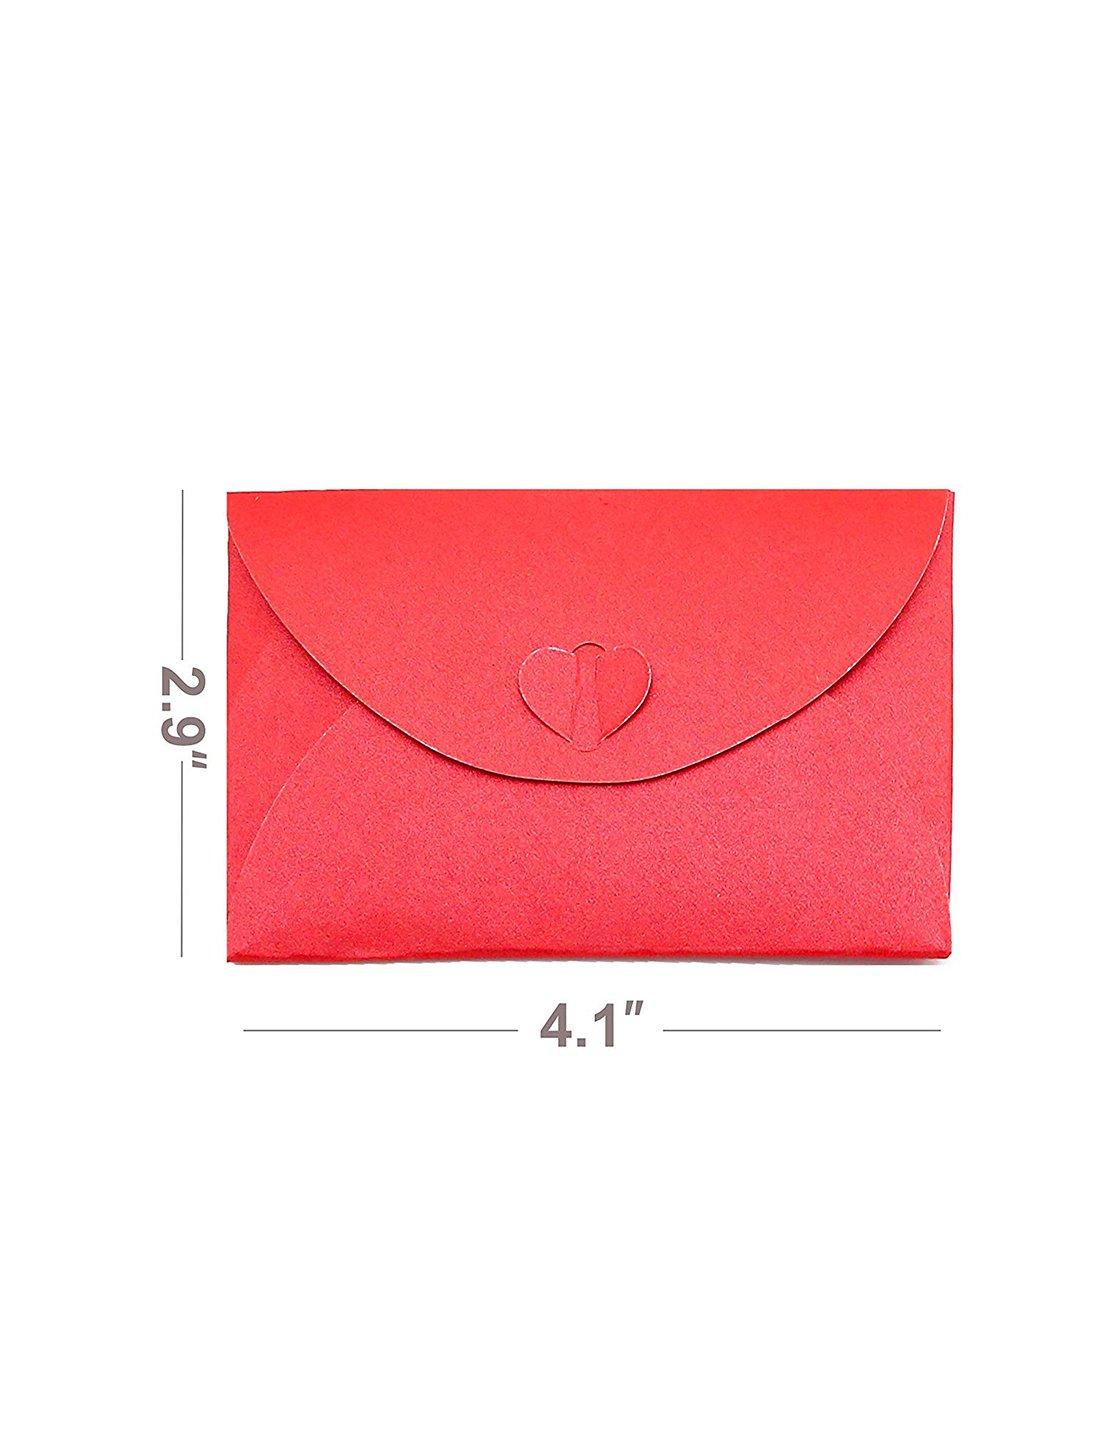 Amazon.com : HansGo 100 PCS Handmade Mini Gift Card Envelopes ...